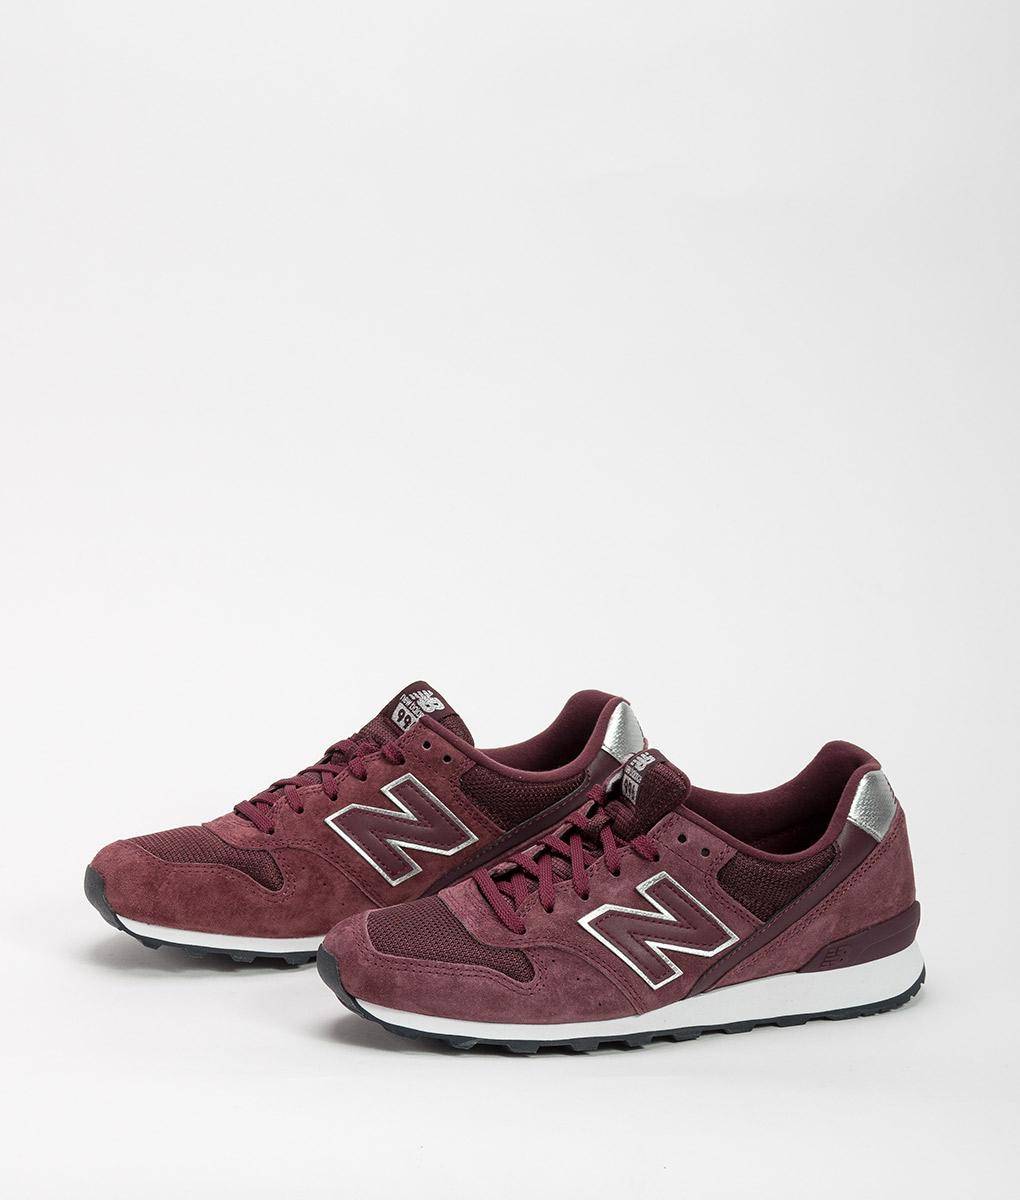 buy popular b749f 91ef7 NEW BALANCE Women Running Shoes WR996 Burgundy HB 99.99 2 – T6/8